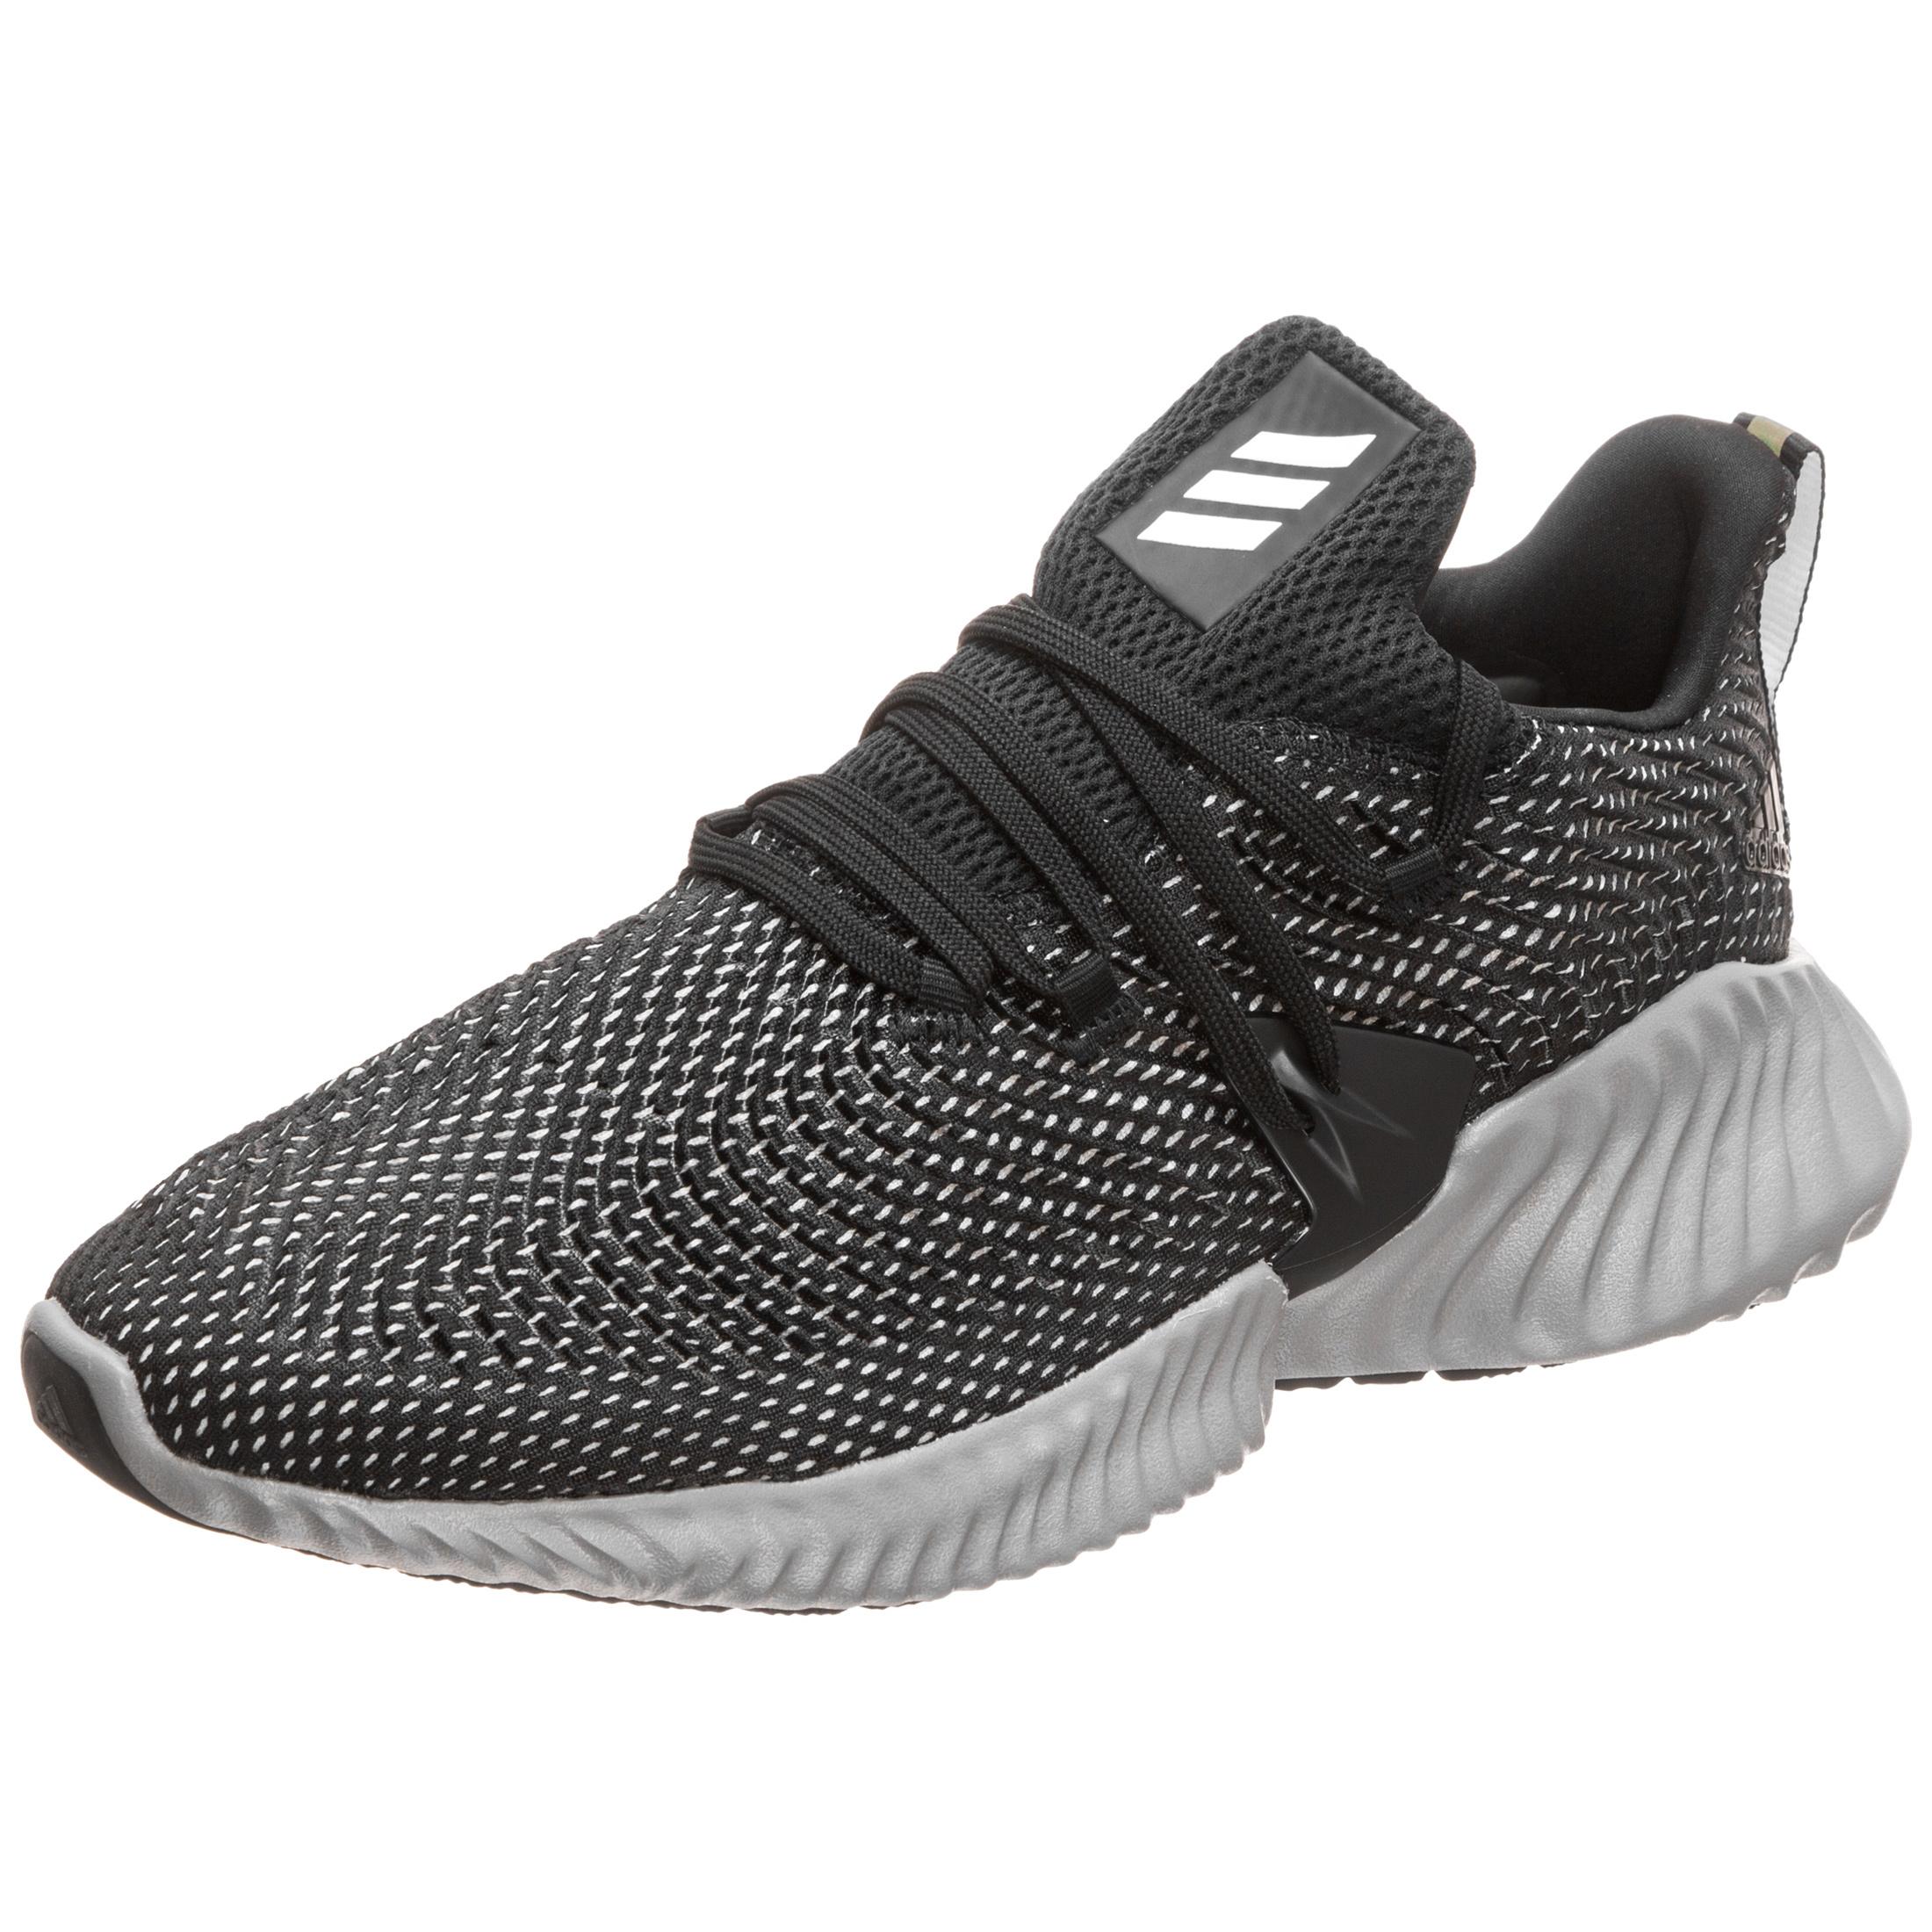 d87e1422fb93a adidas Alphabounce Instinct Shoes